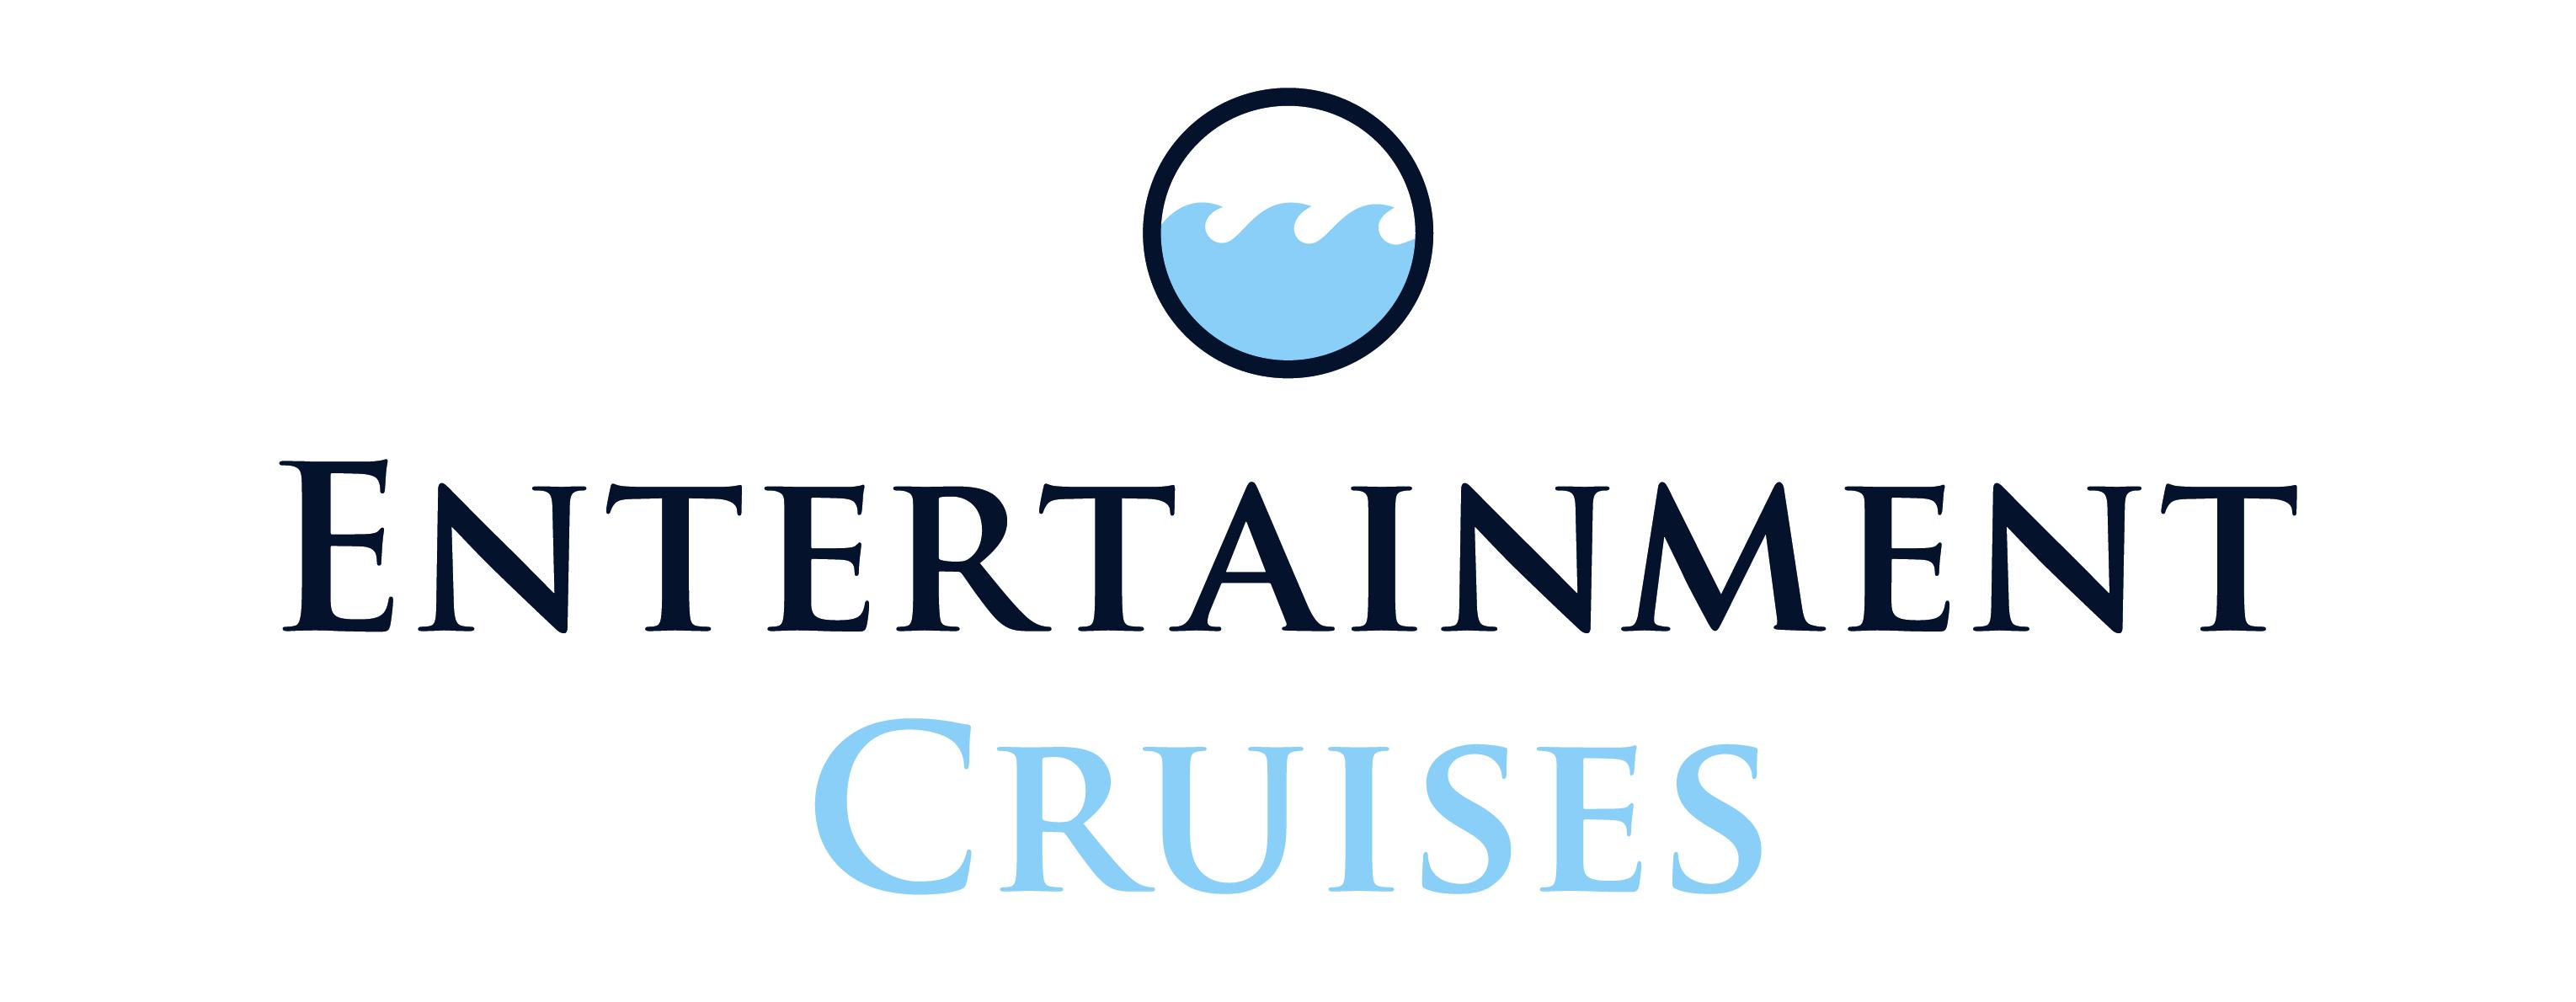 Entertainment Cruises logo